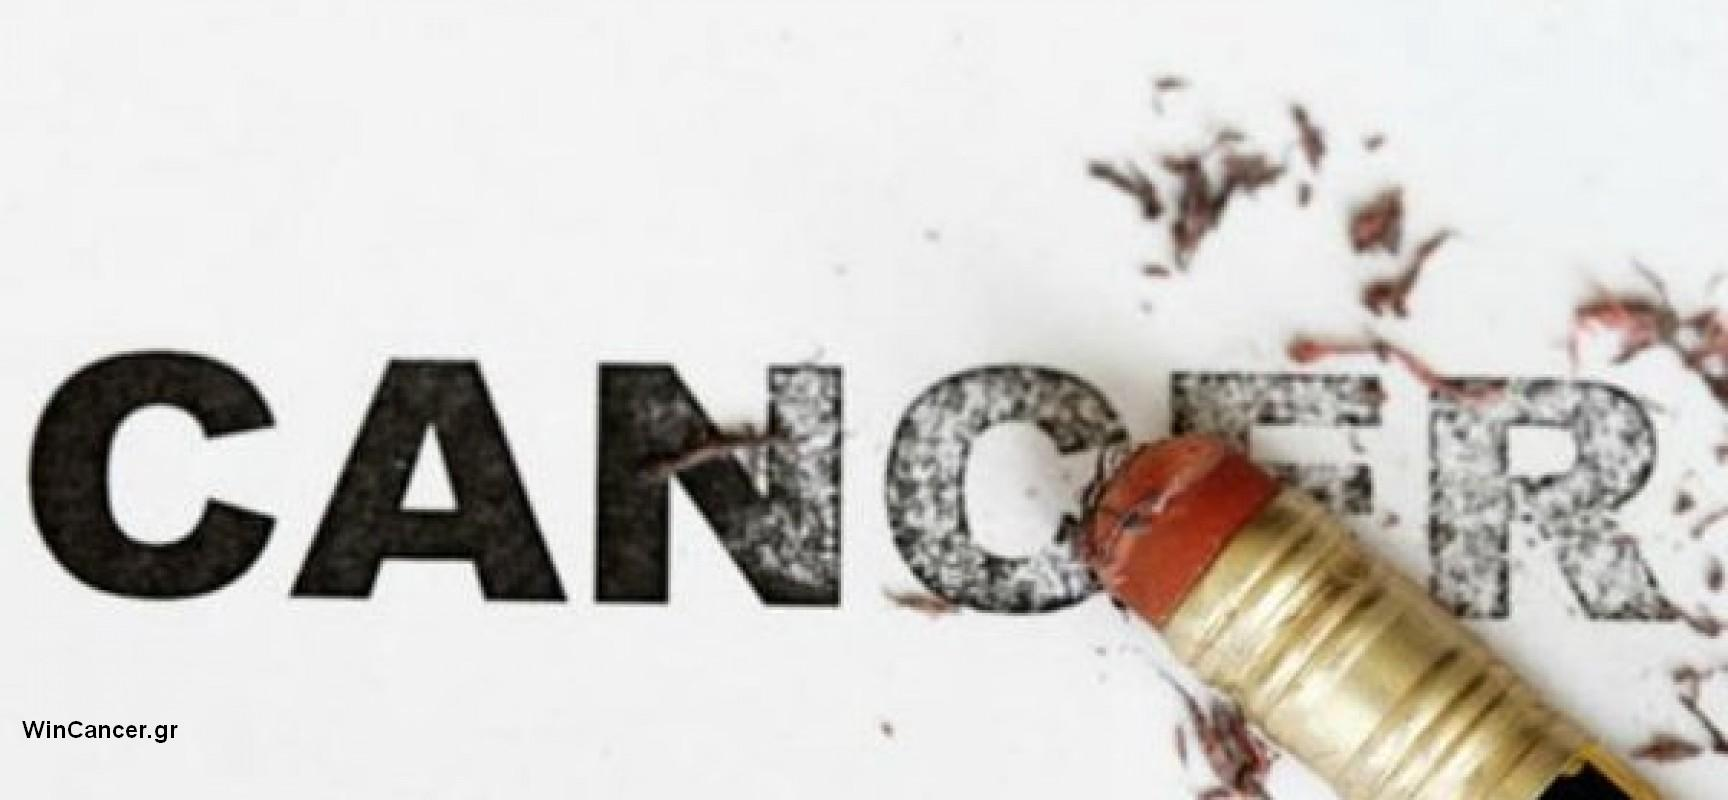 wincancer ο καρκινος νικιέται